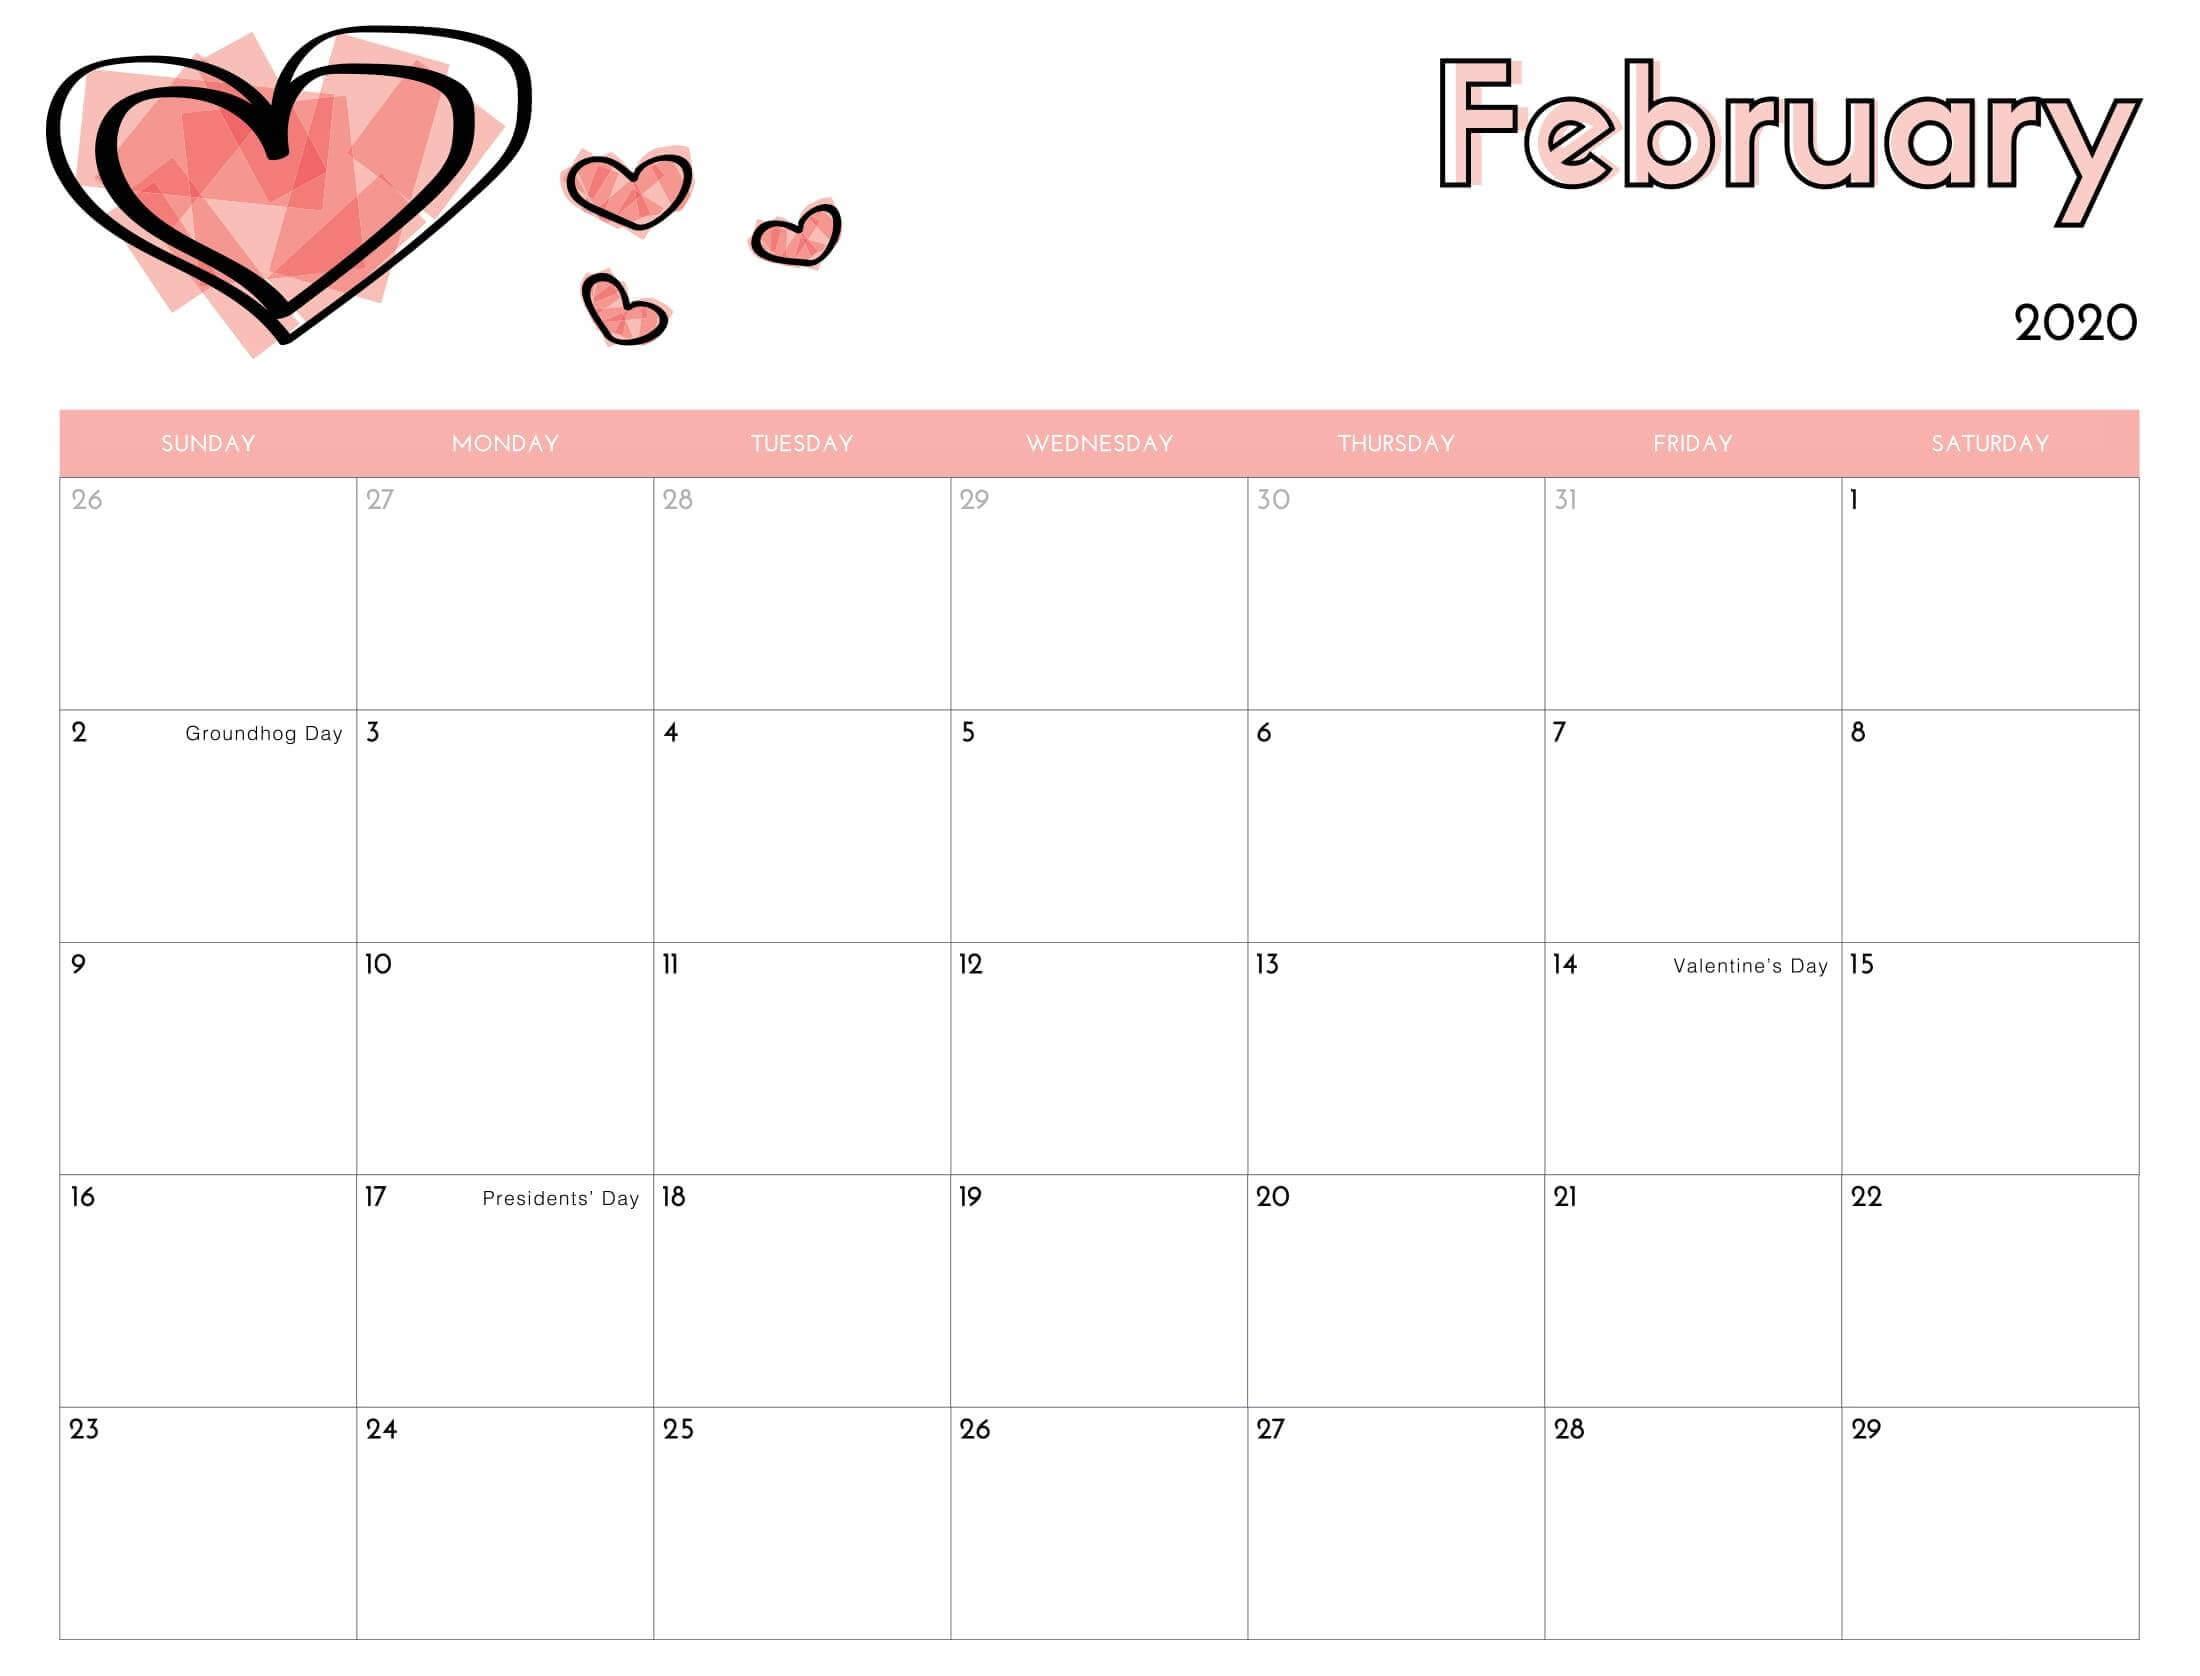 Calendar 2020 Excel  February 2020 Calendar Excel | Monthly regarding Hong Kong Calendar 2020 Excel